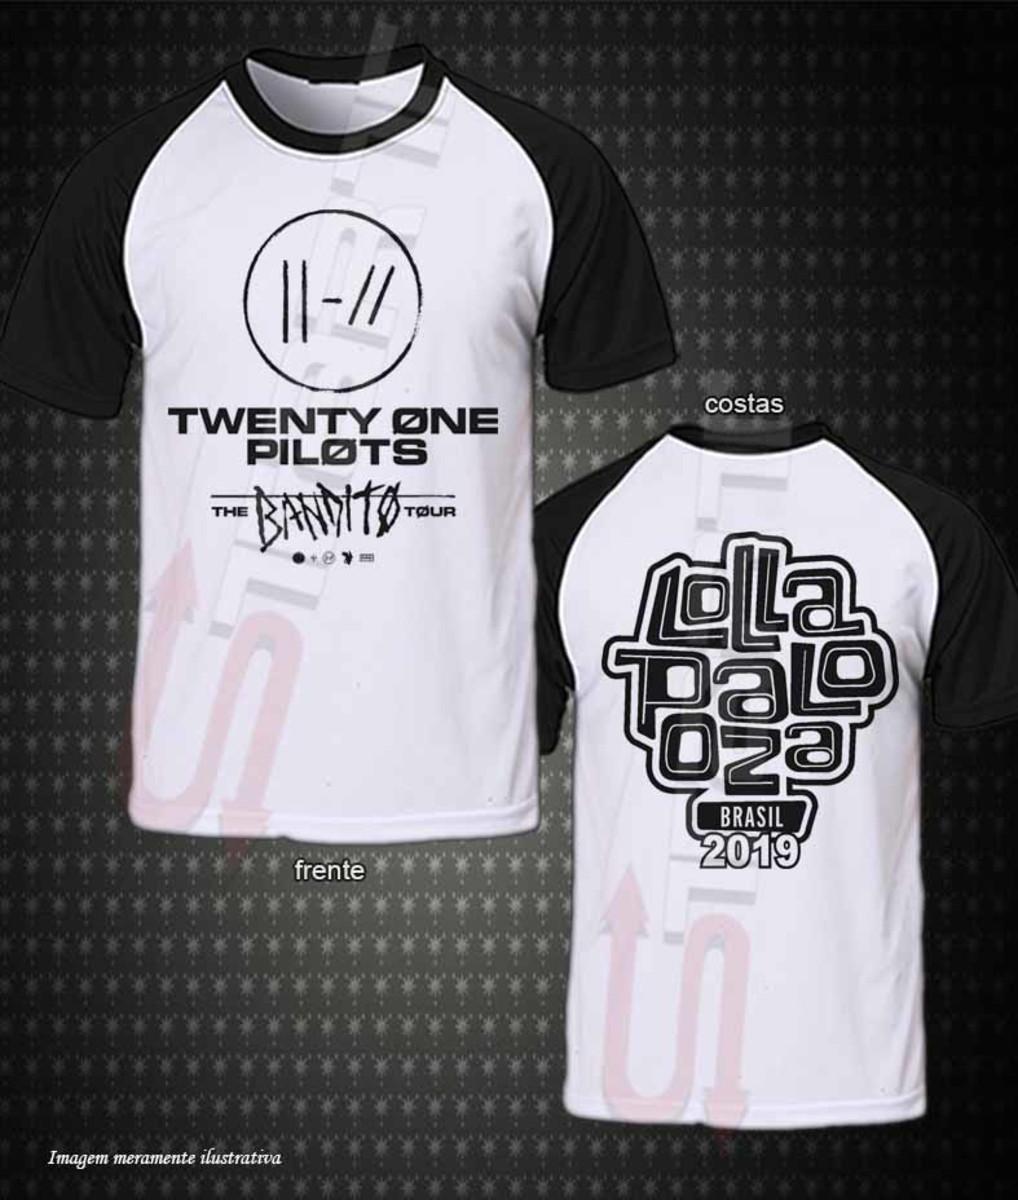 Camiseta Raglan Twenty One Pilots (lollapalooza 2019) no Elo7 ... dee1add2bcf